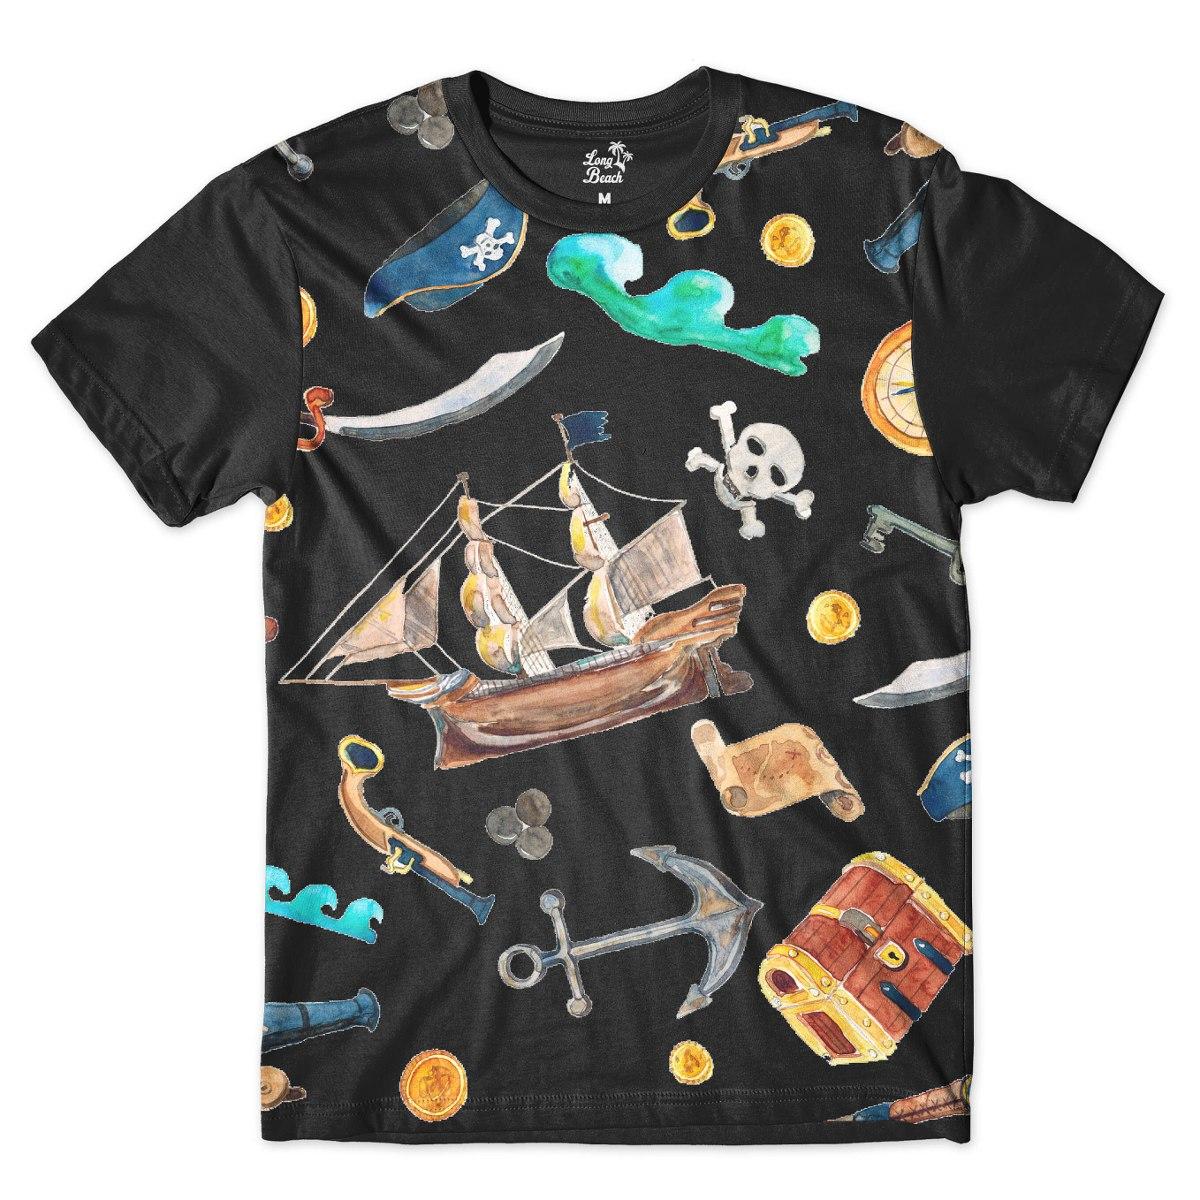 camiseta long beach náutica elementos piratas full print pre. Carregando  zoom. 762c737126